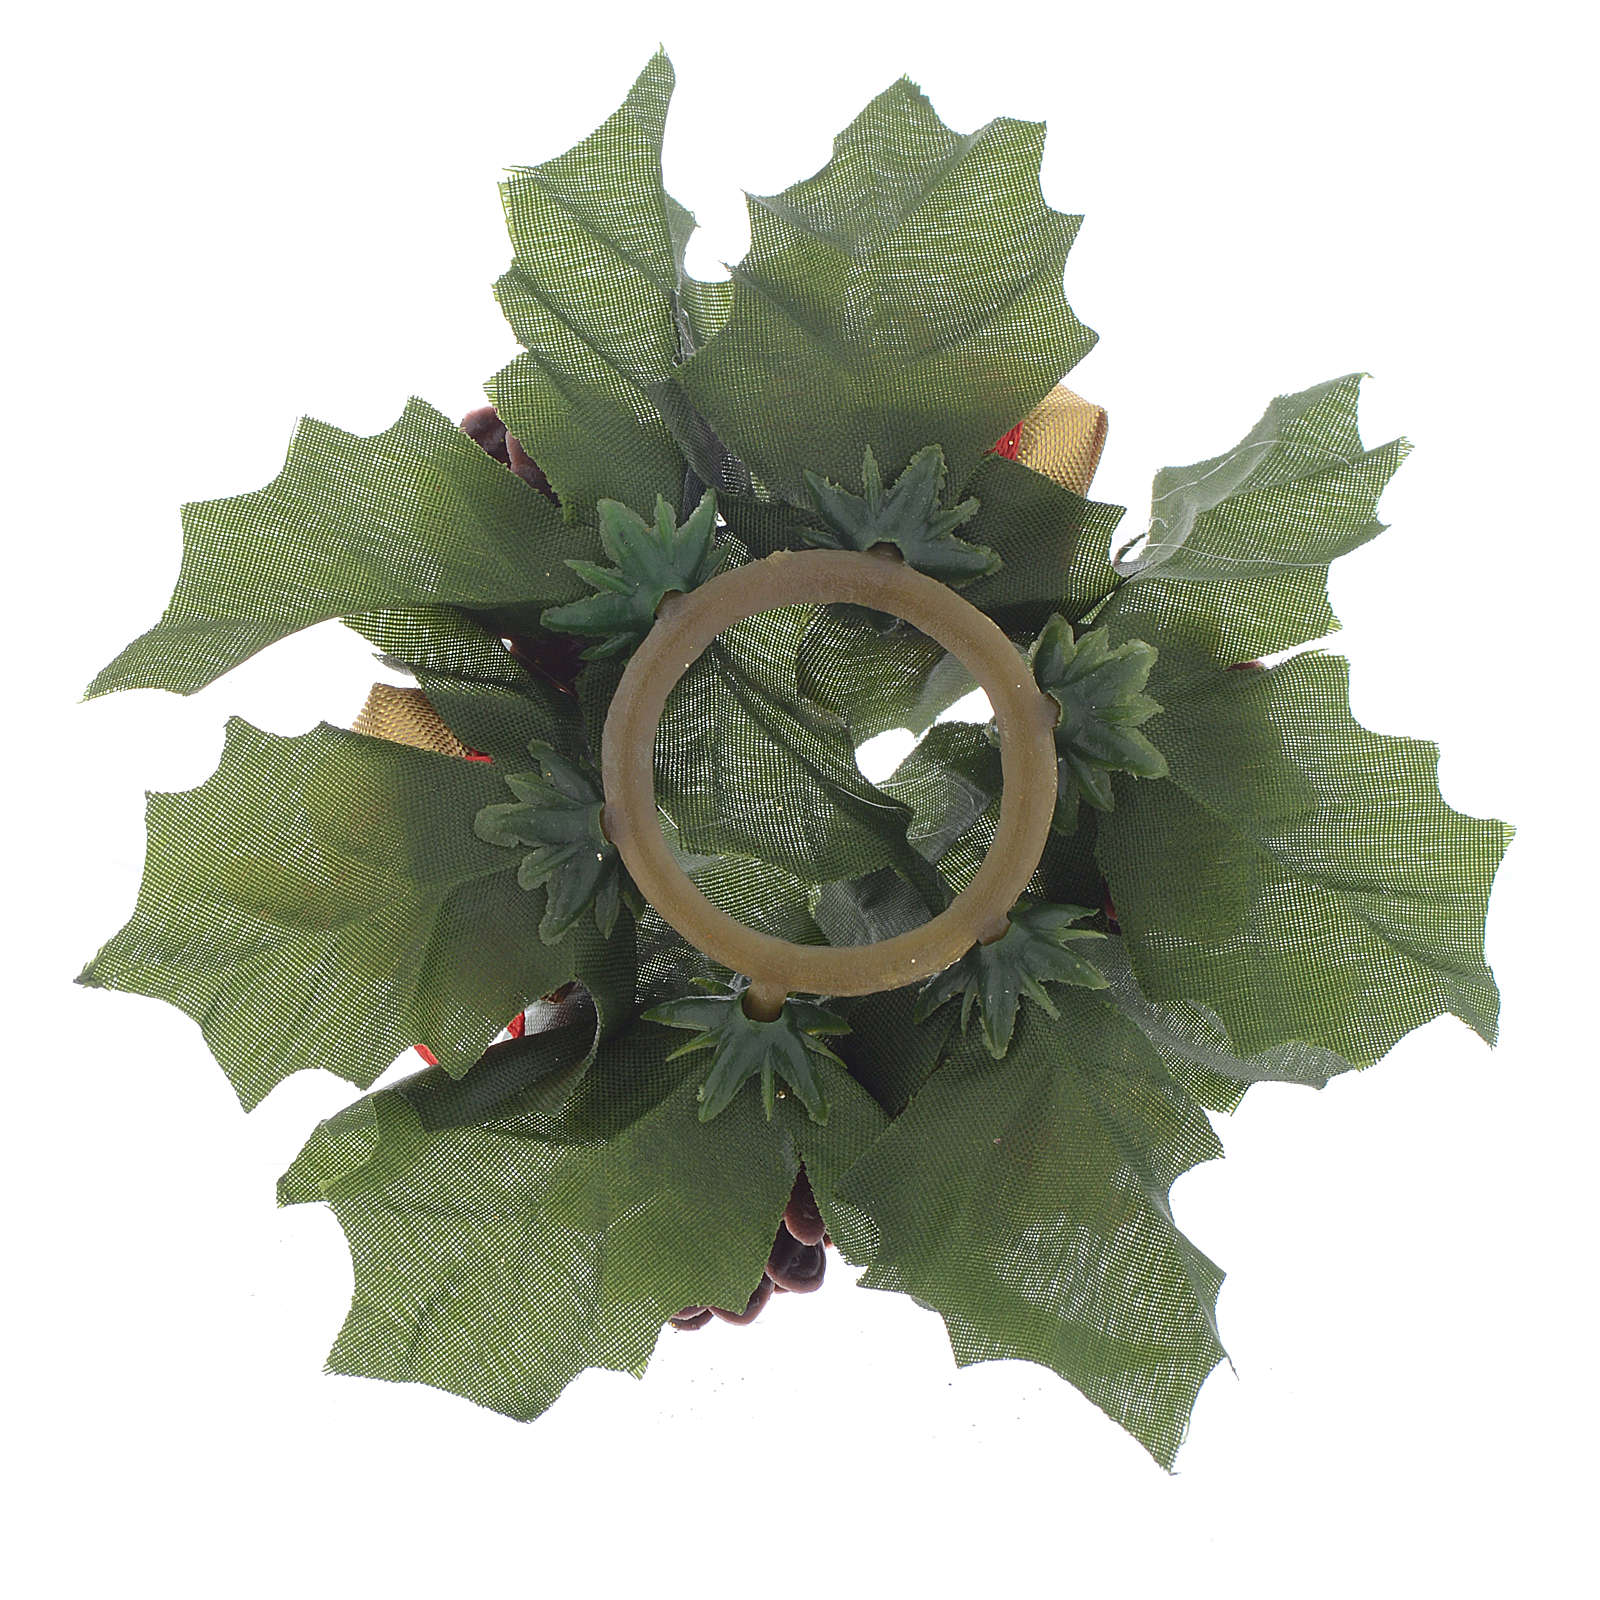 Girocandela natalizio (per candela sfera) pigne stelle bianche 3